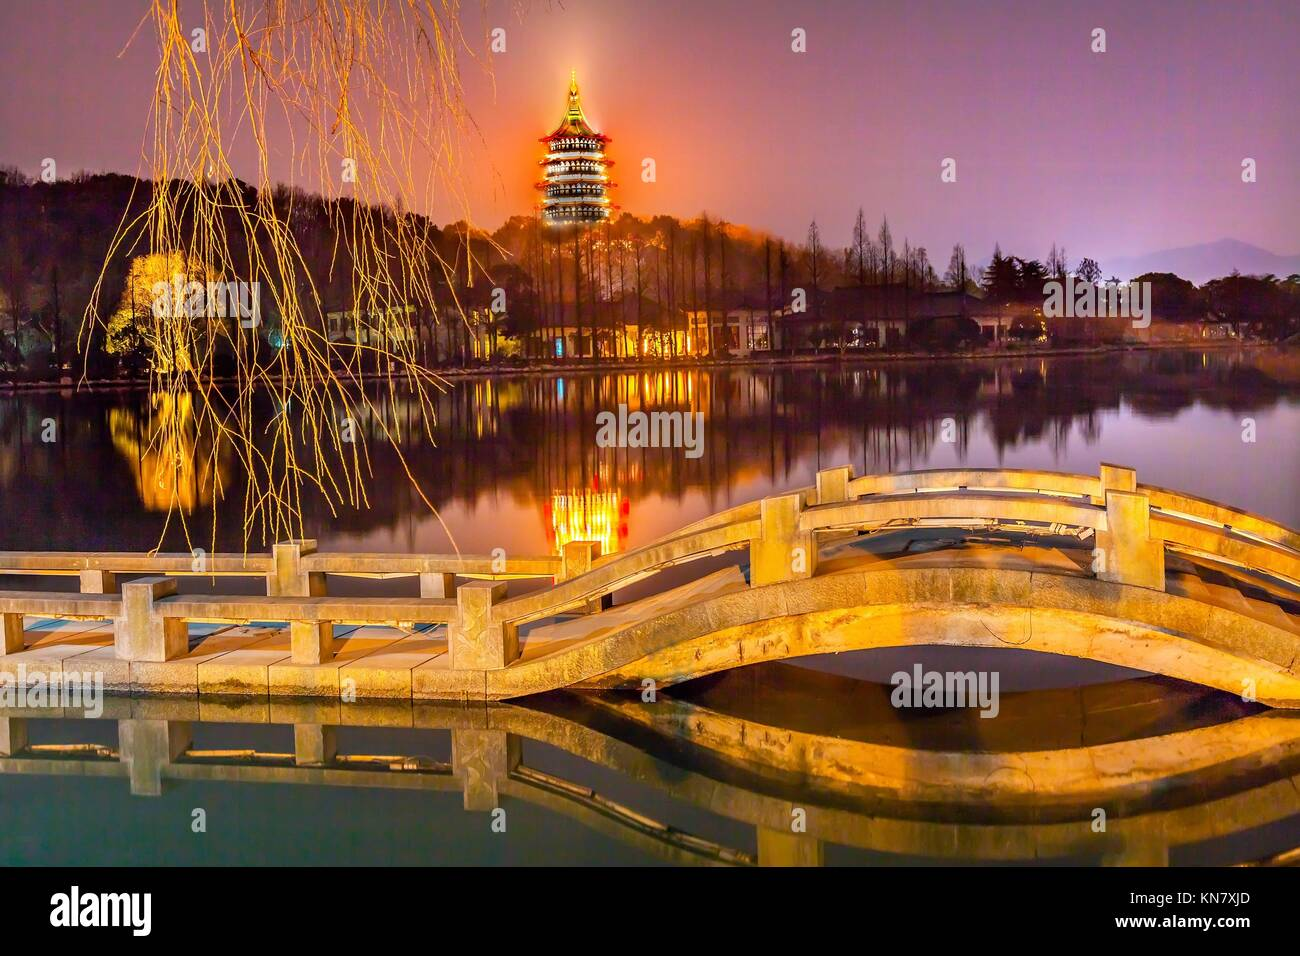 Pagoda And Bridge Stock Photos & Pagoda And Bridge Stock Images - Alamy